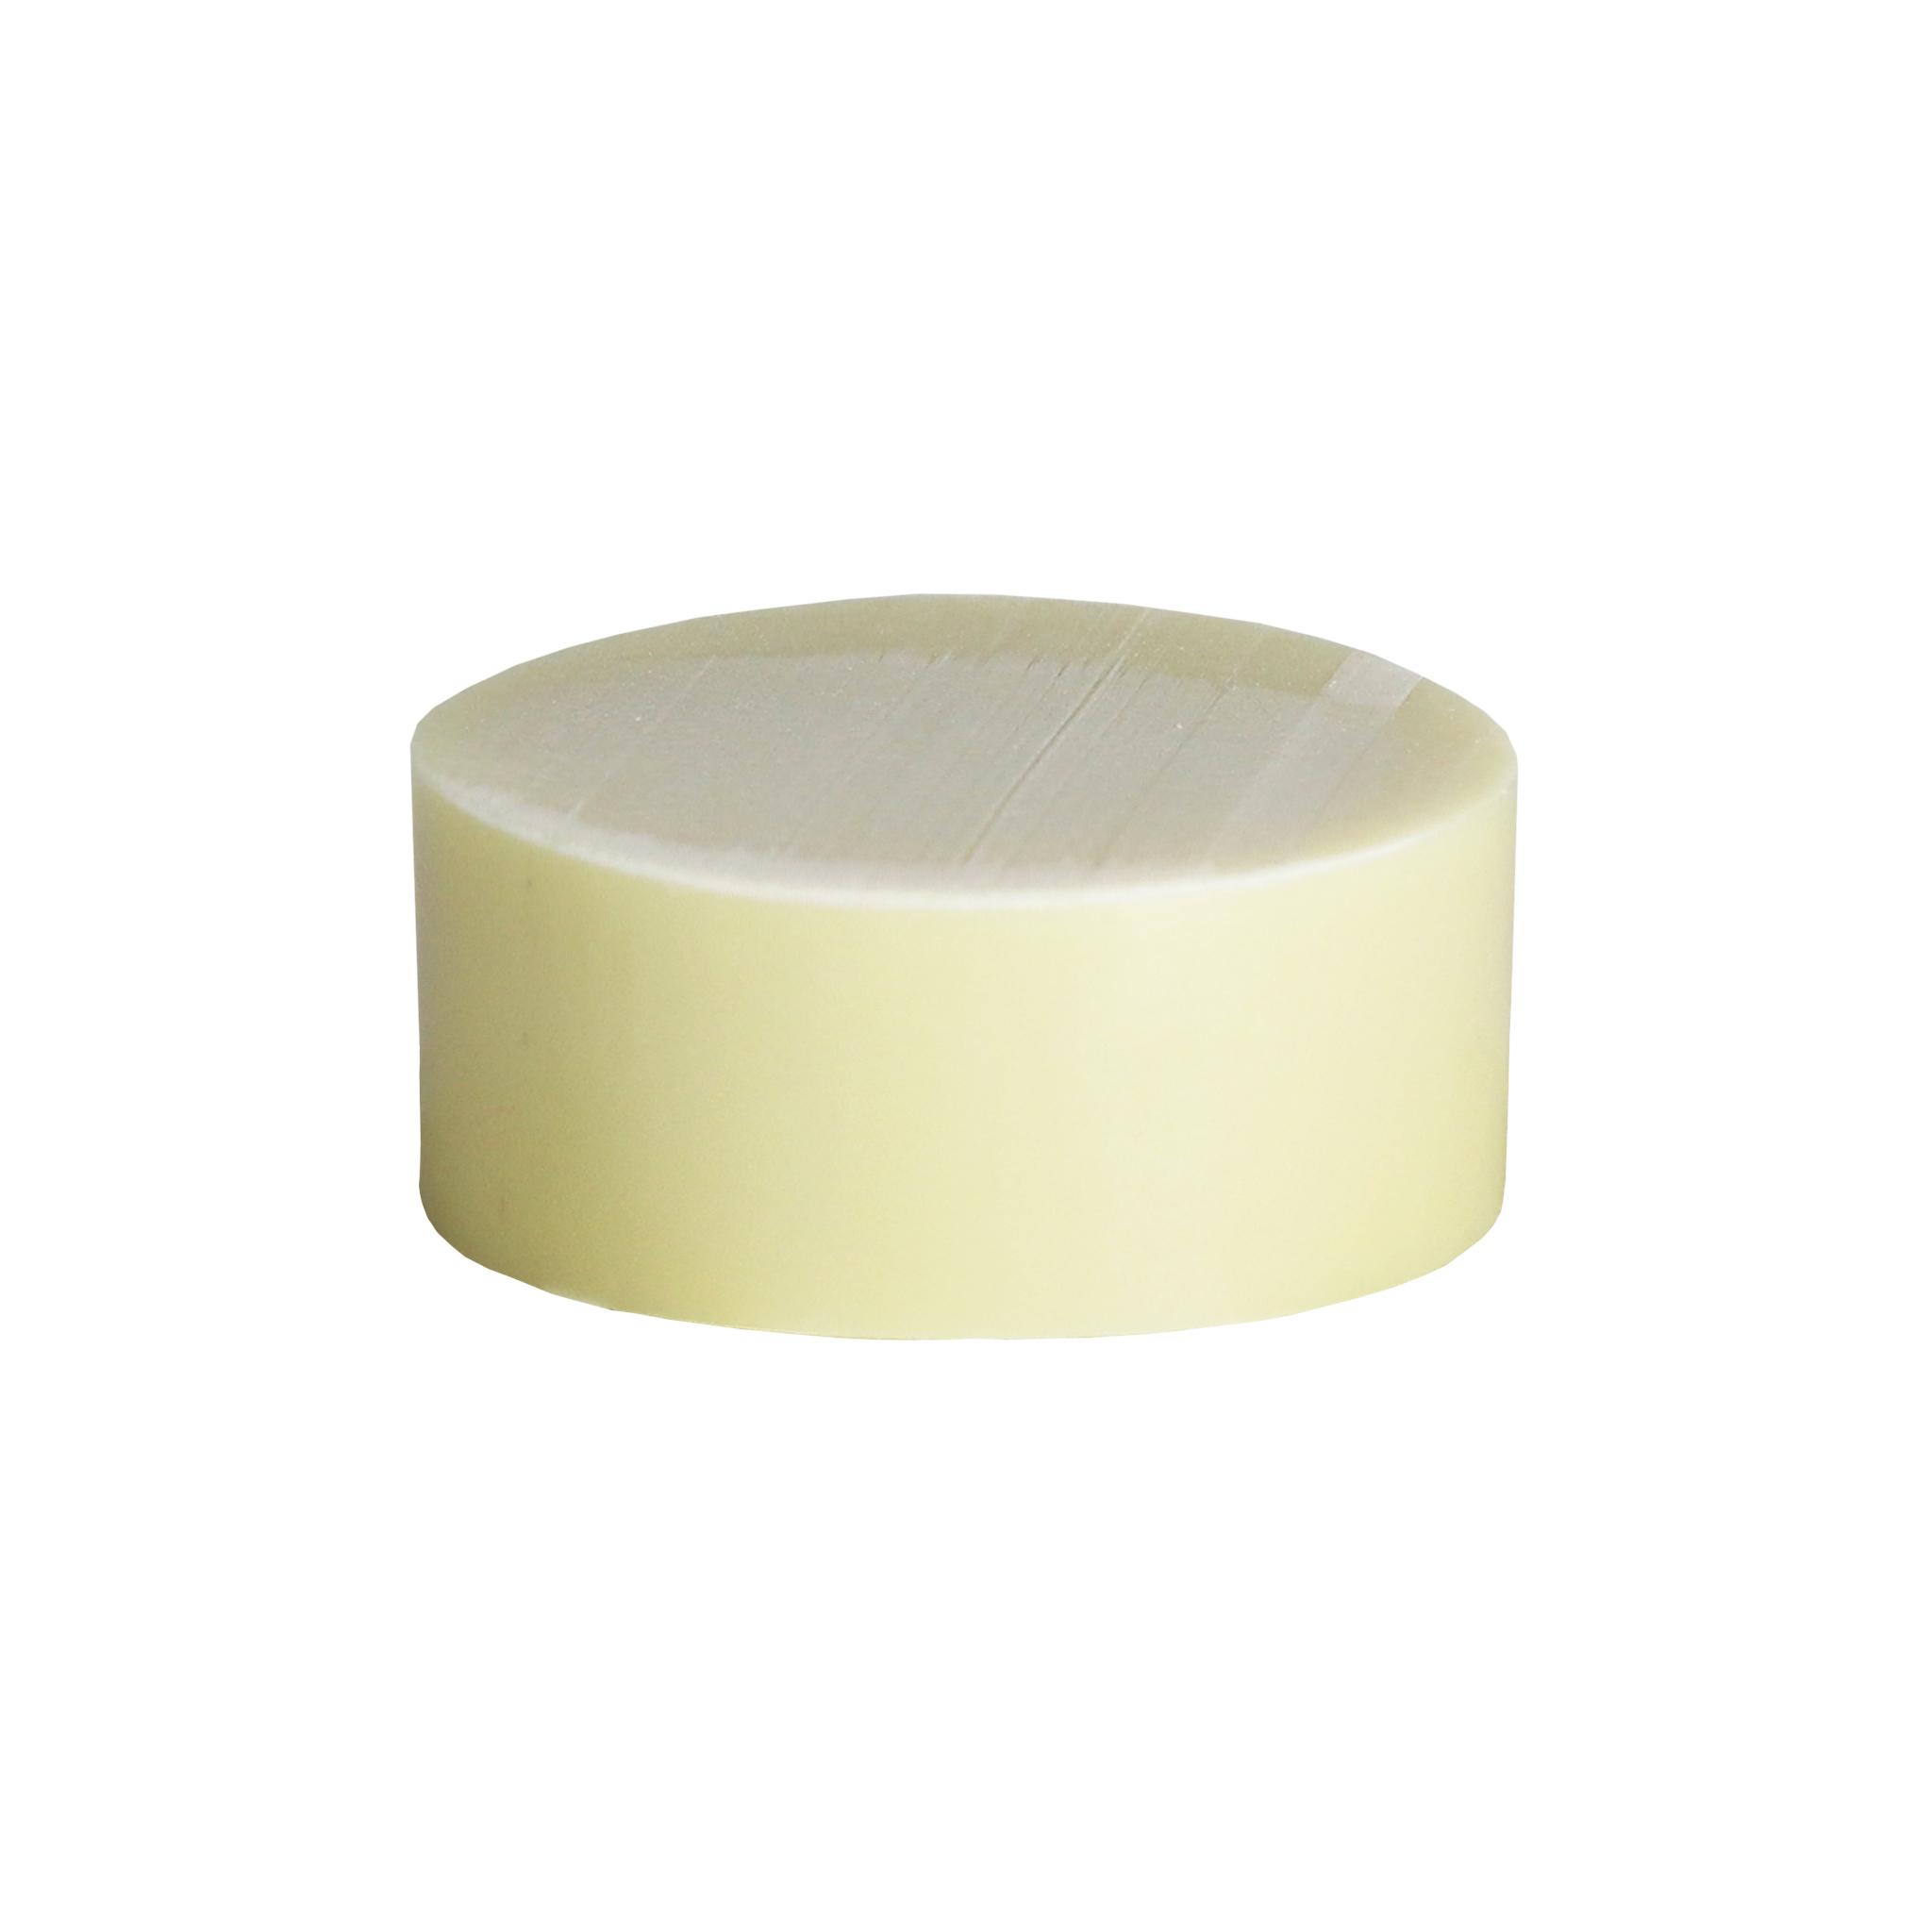 HRANITHERM 1000.30 Transparent - EVA Thermofusible